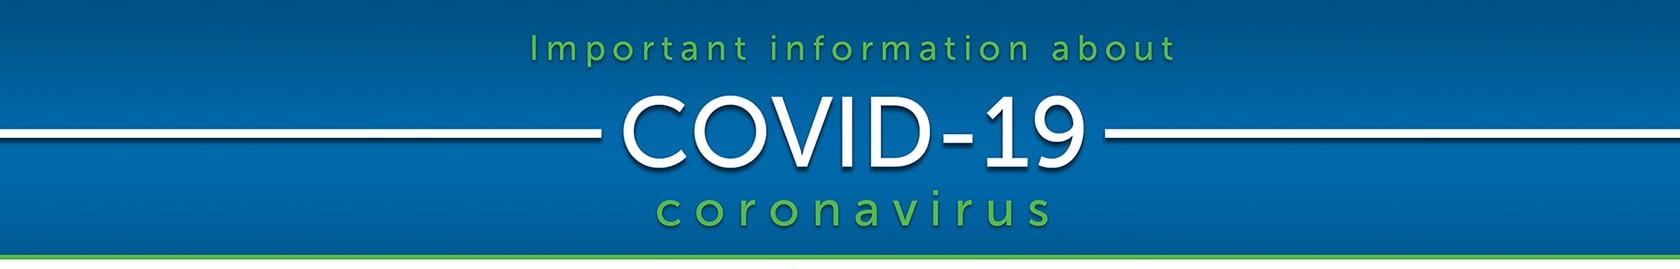 COVID-19 Blog Banner Image